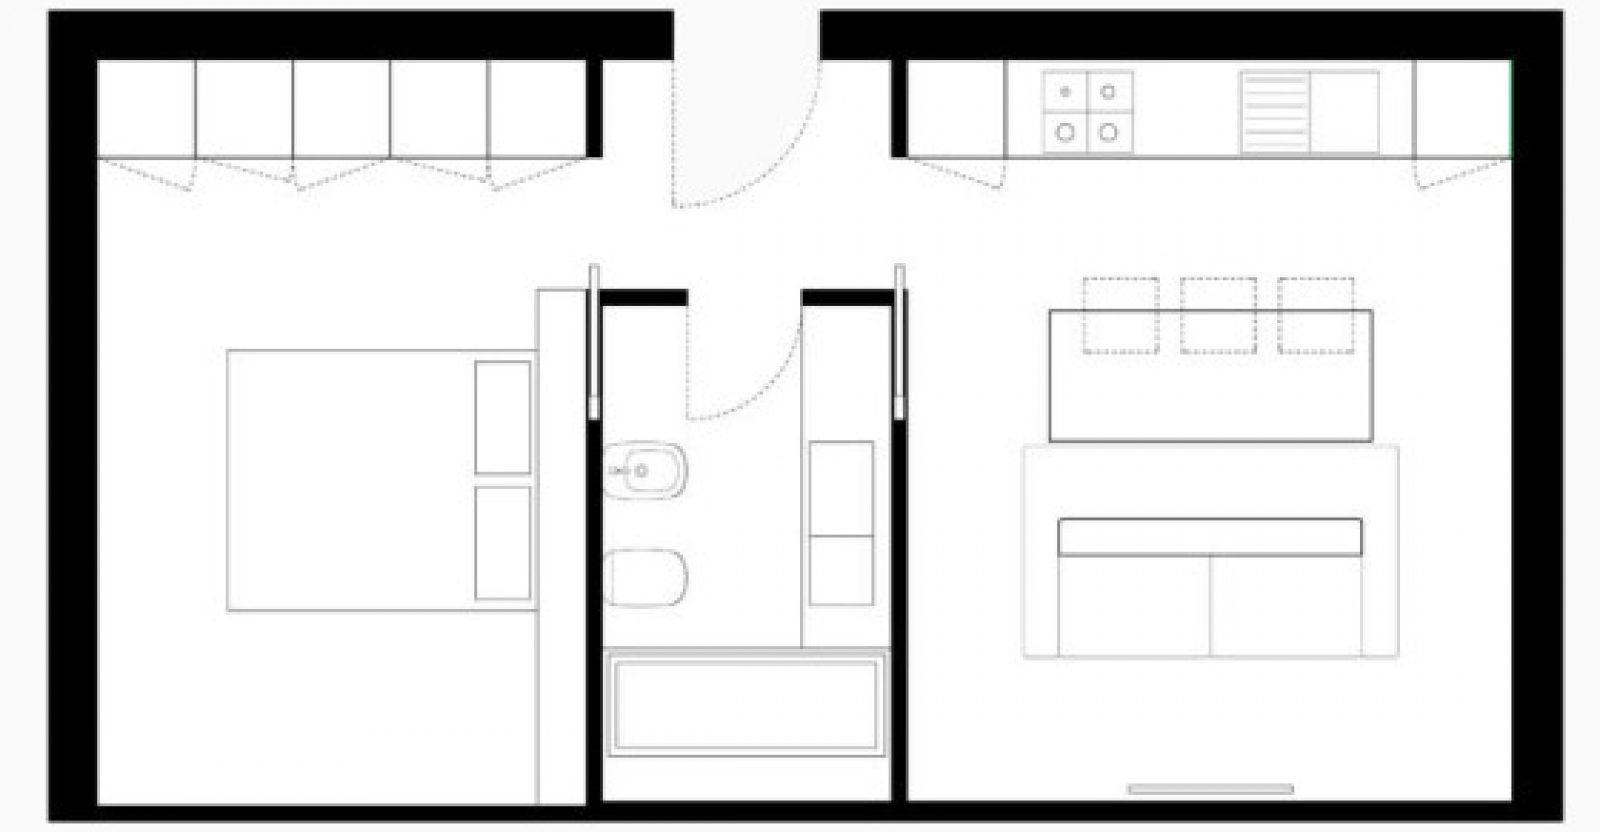 Planos de peque o departamento d plex descubre la armon a for Diseno apartamentos duplex pequenos